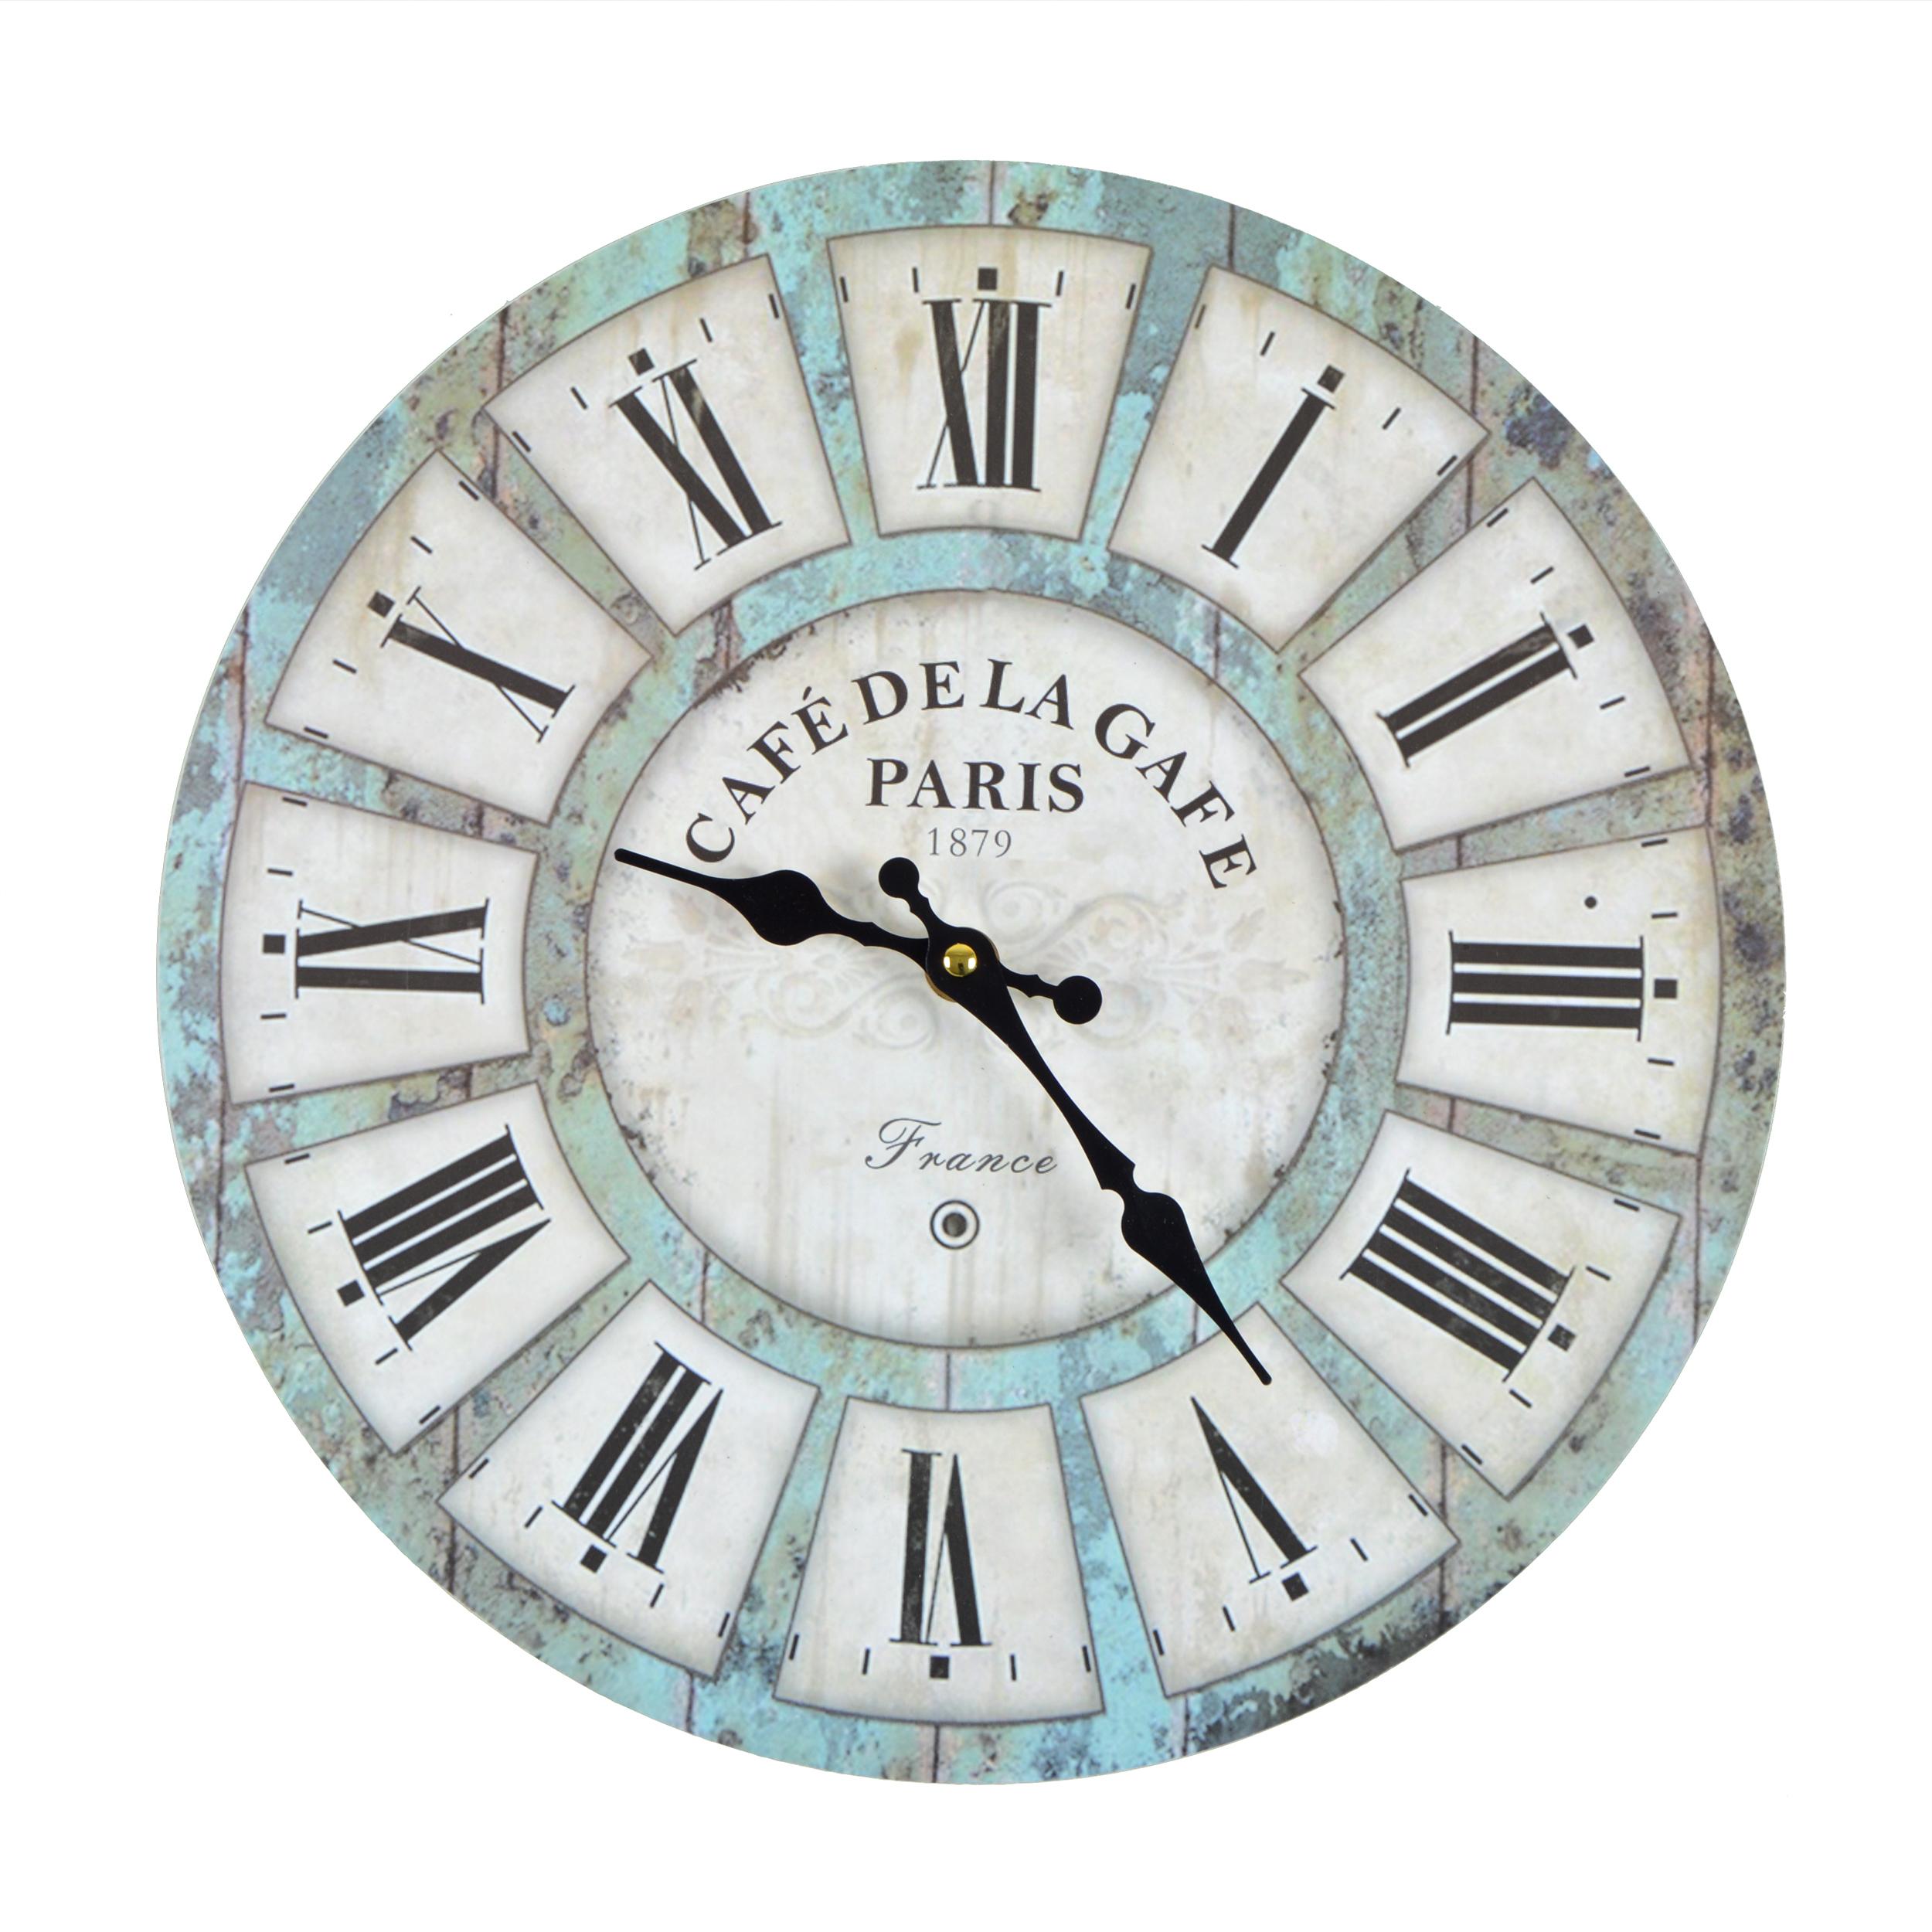 Wanduhr Cafe Garde - blau - Vintage Uhr